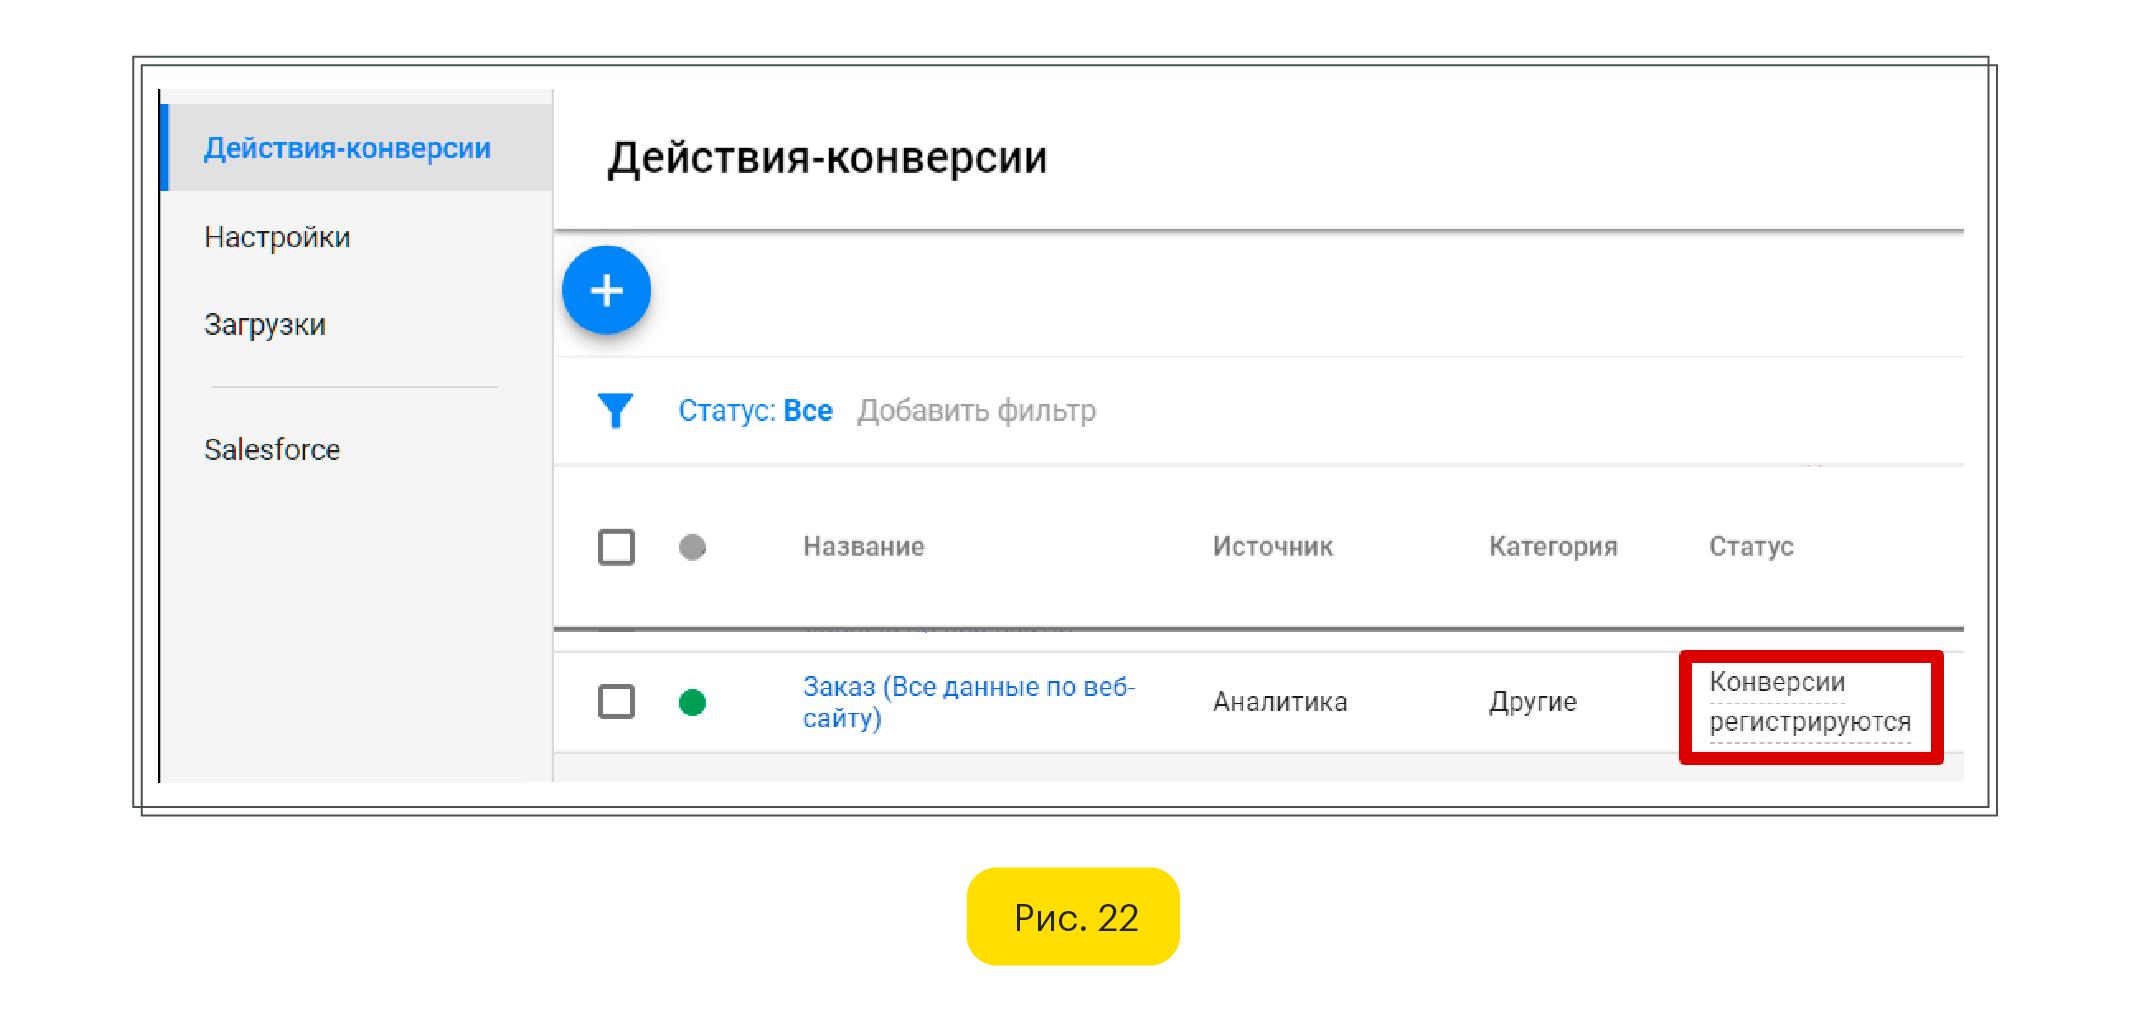 Проверка конверсий в Google Ads